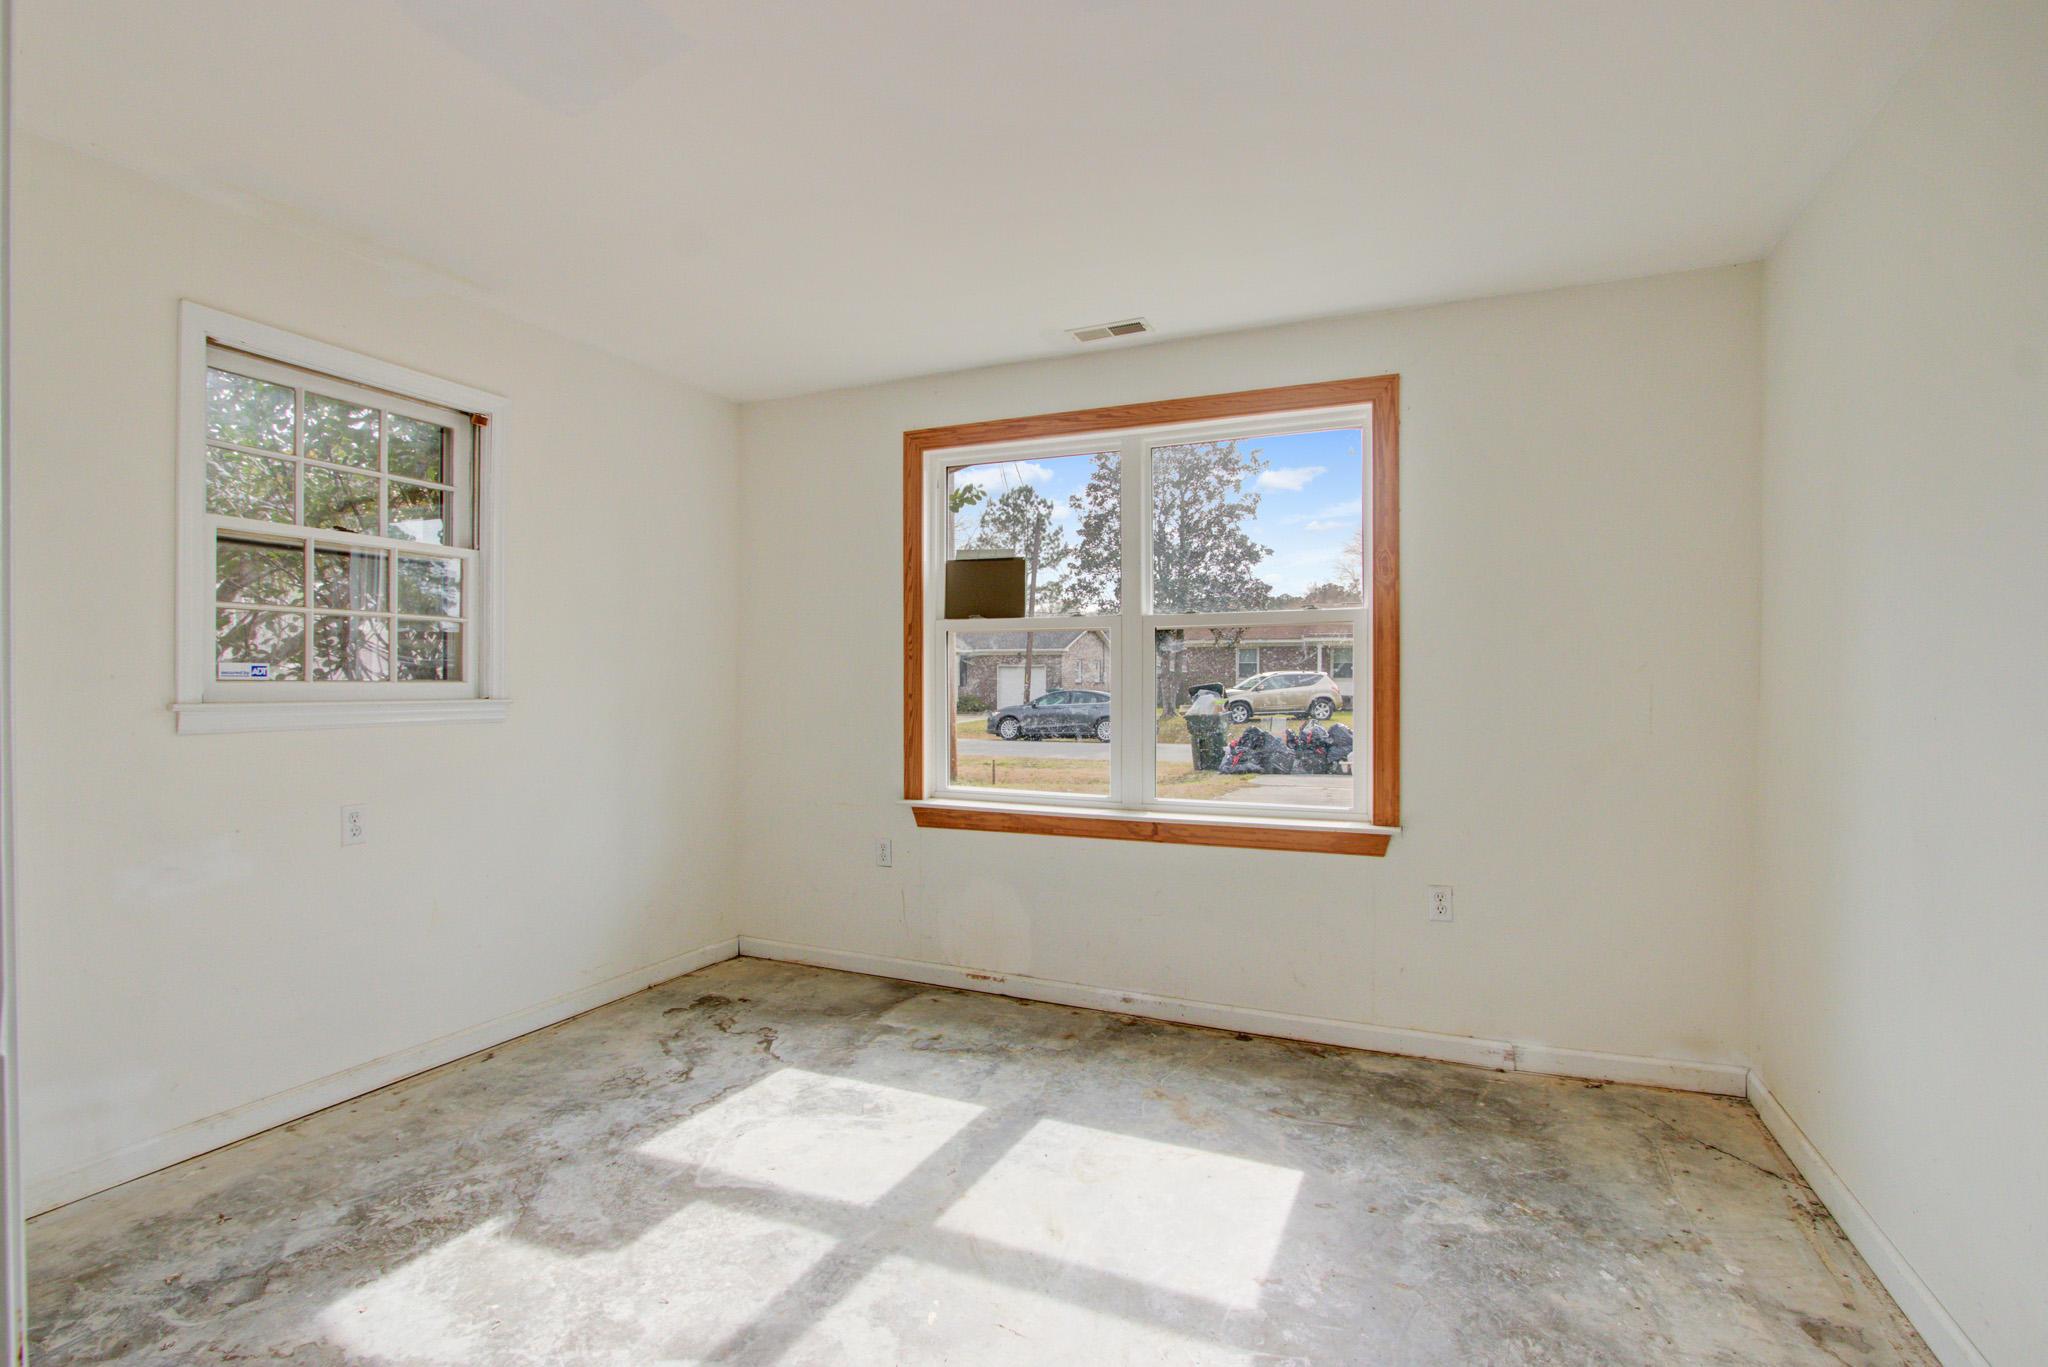 Bushy Park Terrace Homes For Sale - 125 Azalea, Goose Creek, SC - 3